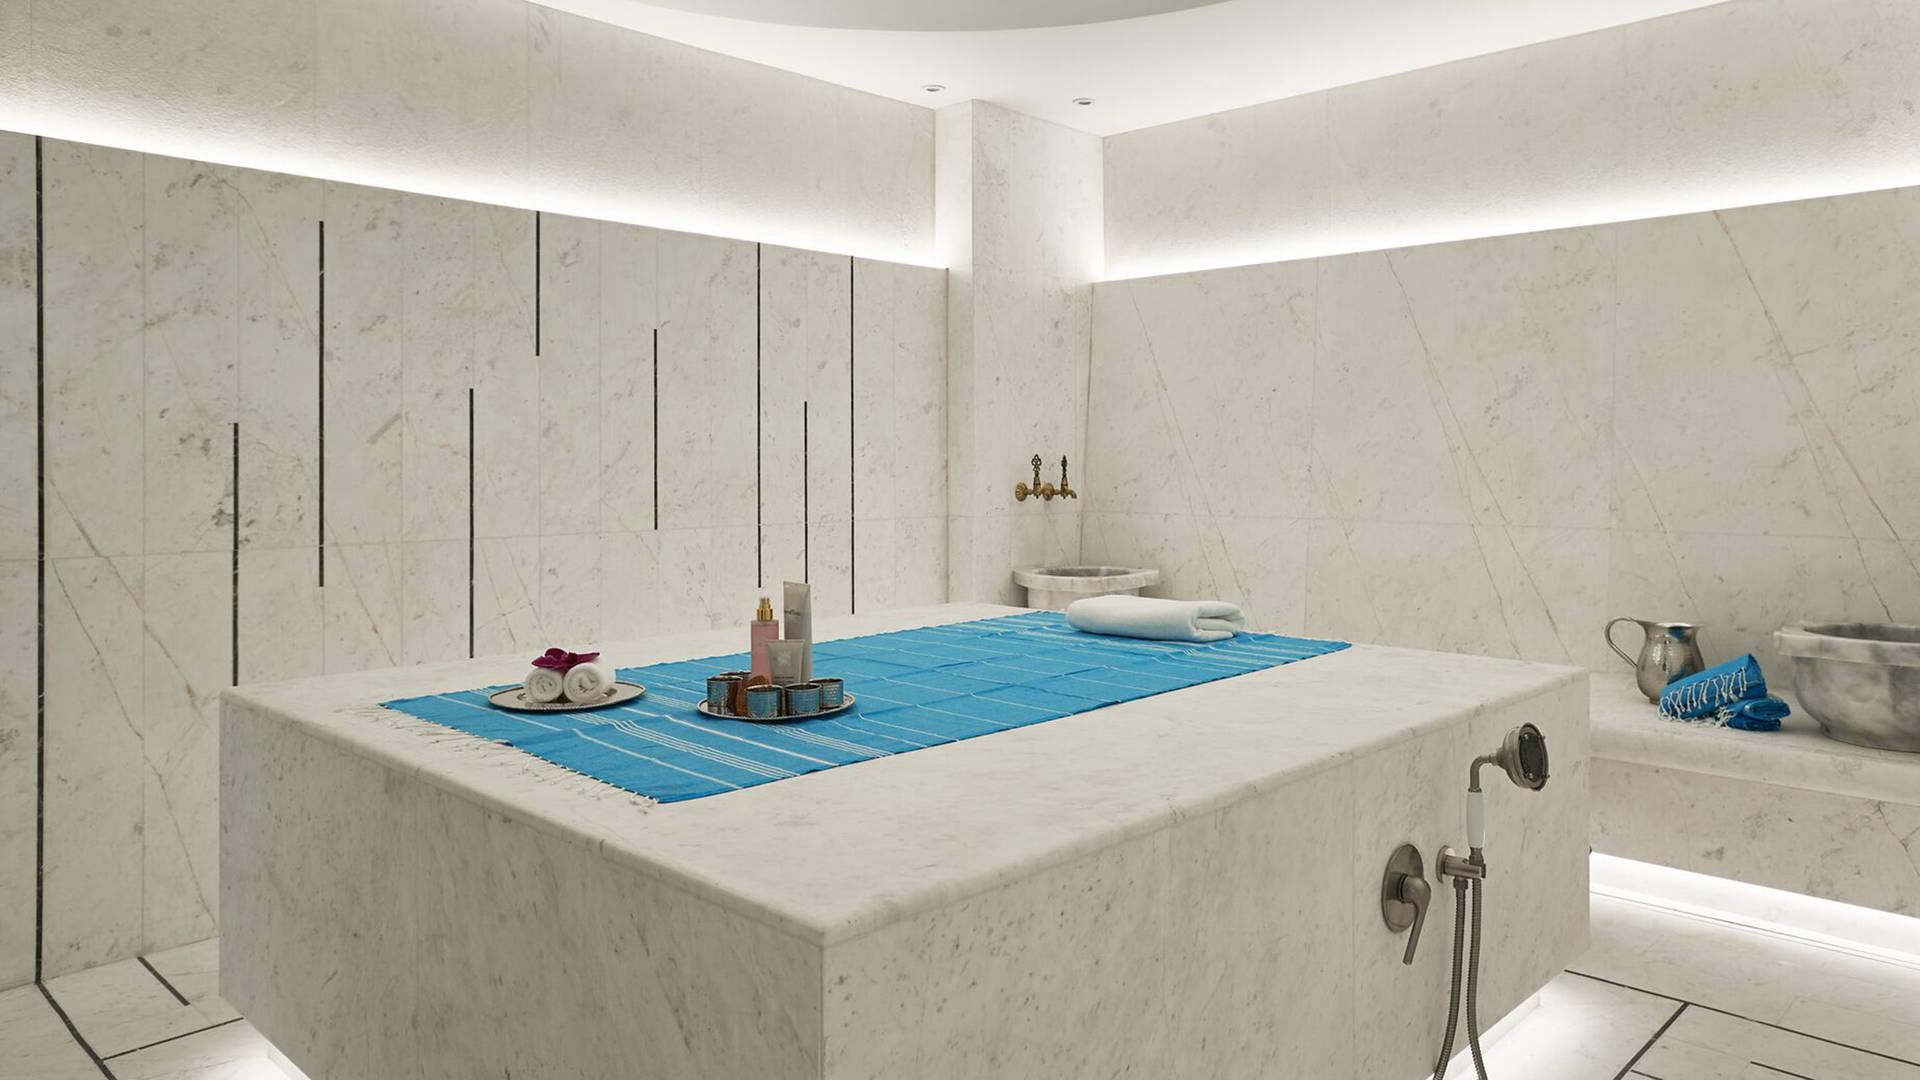 A massage treatment room in a hammam